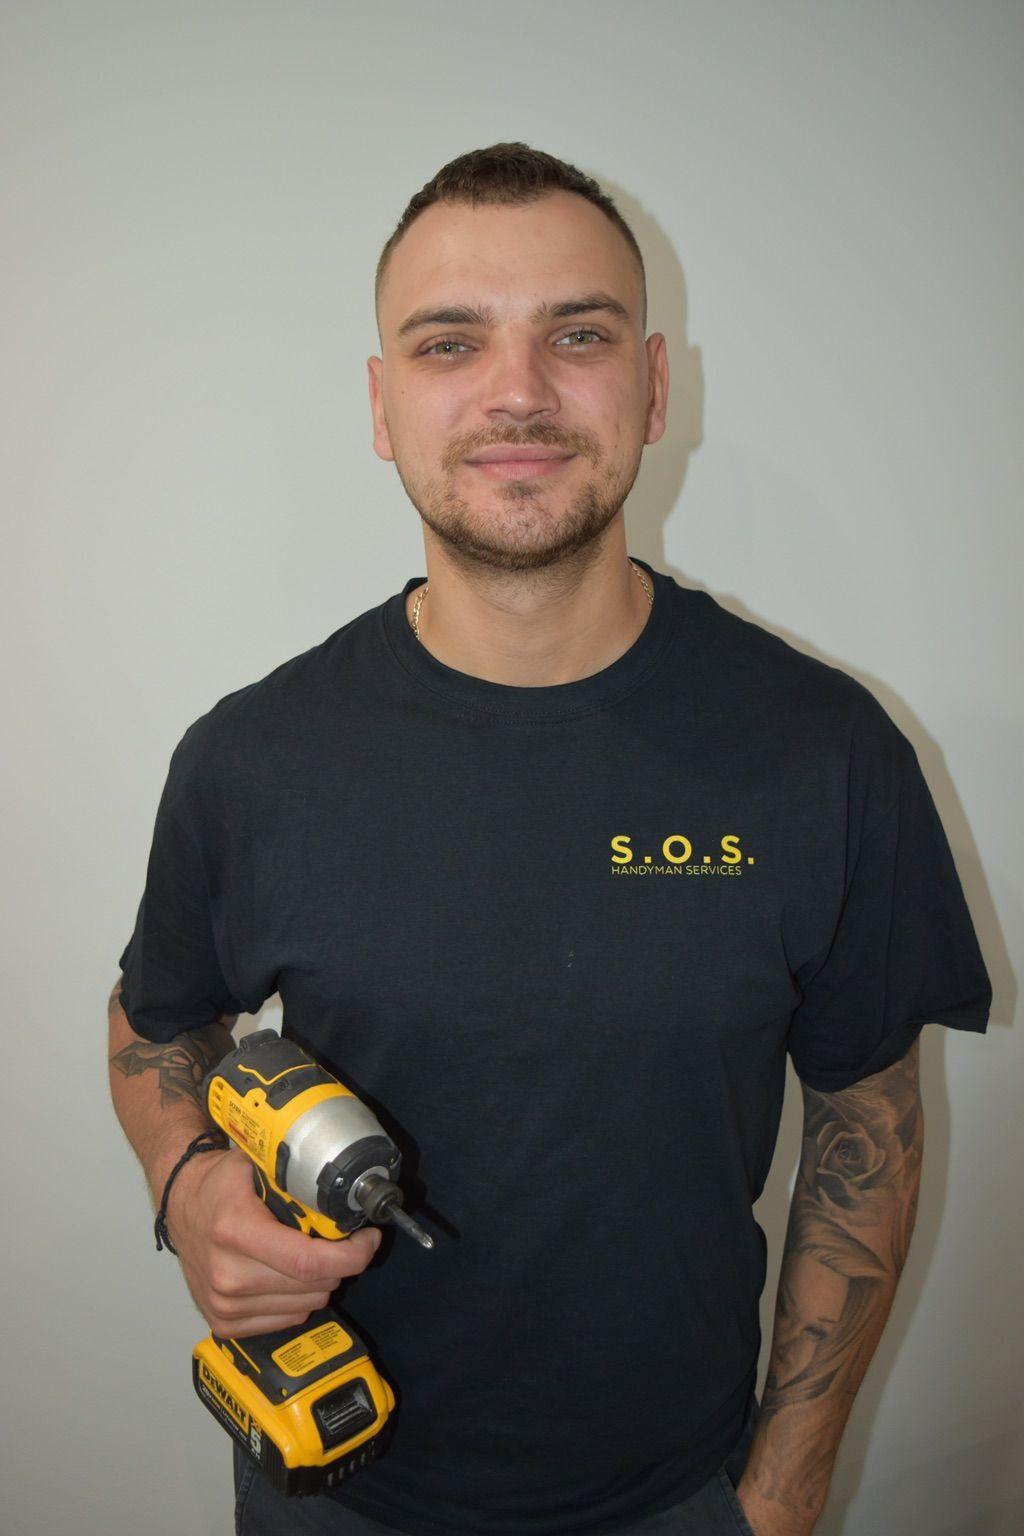 S.O.S Handyman Services